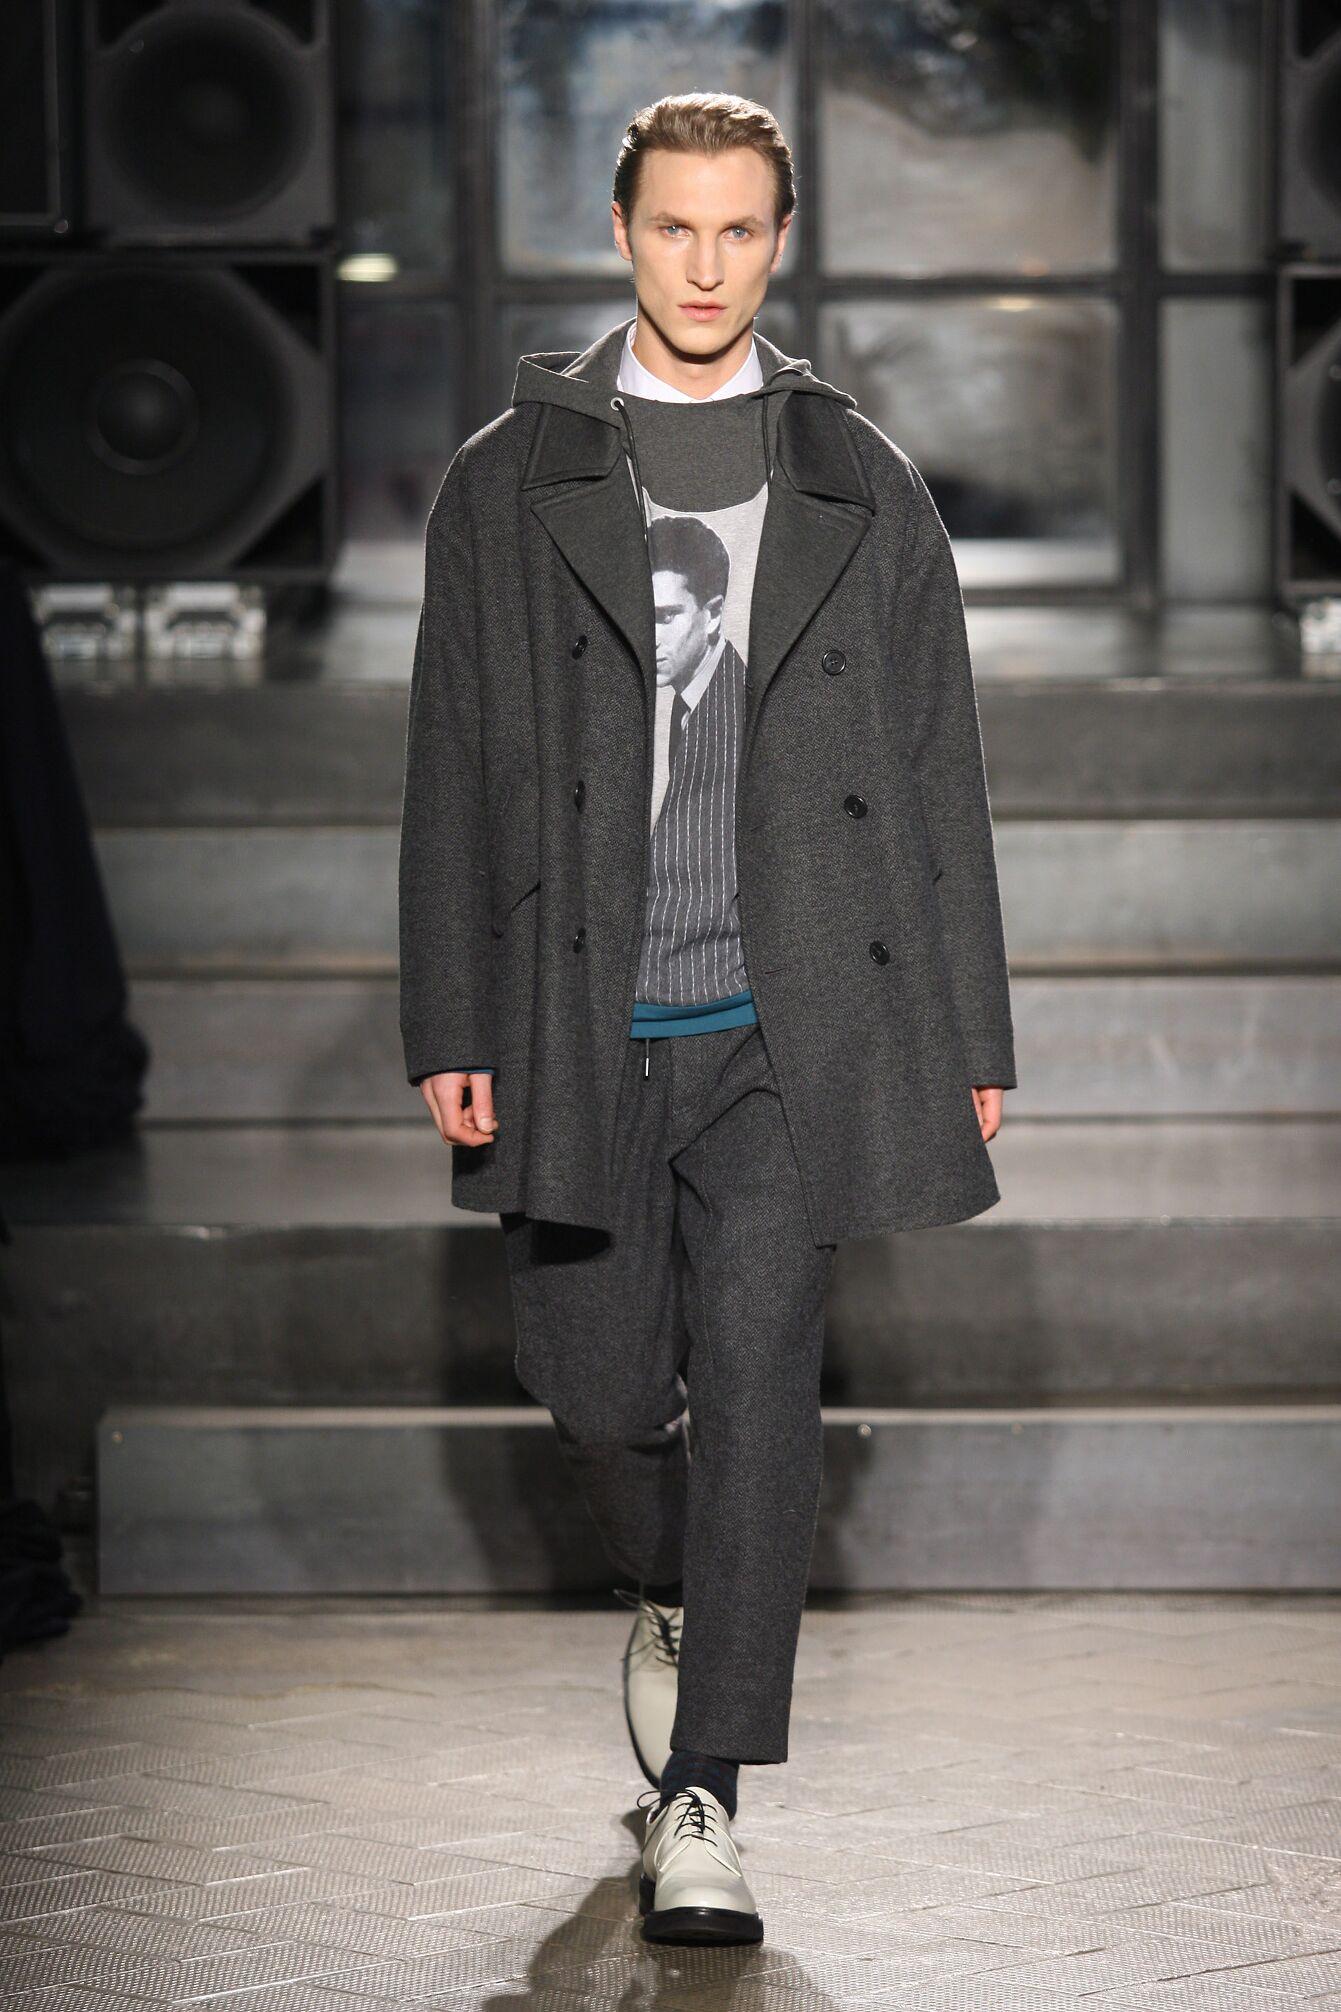 Antonio Marras Fashion Show FW 2014 2015